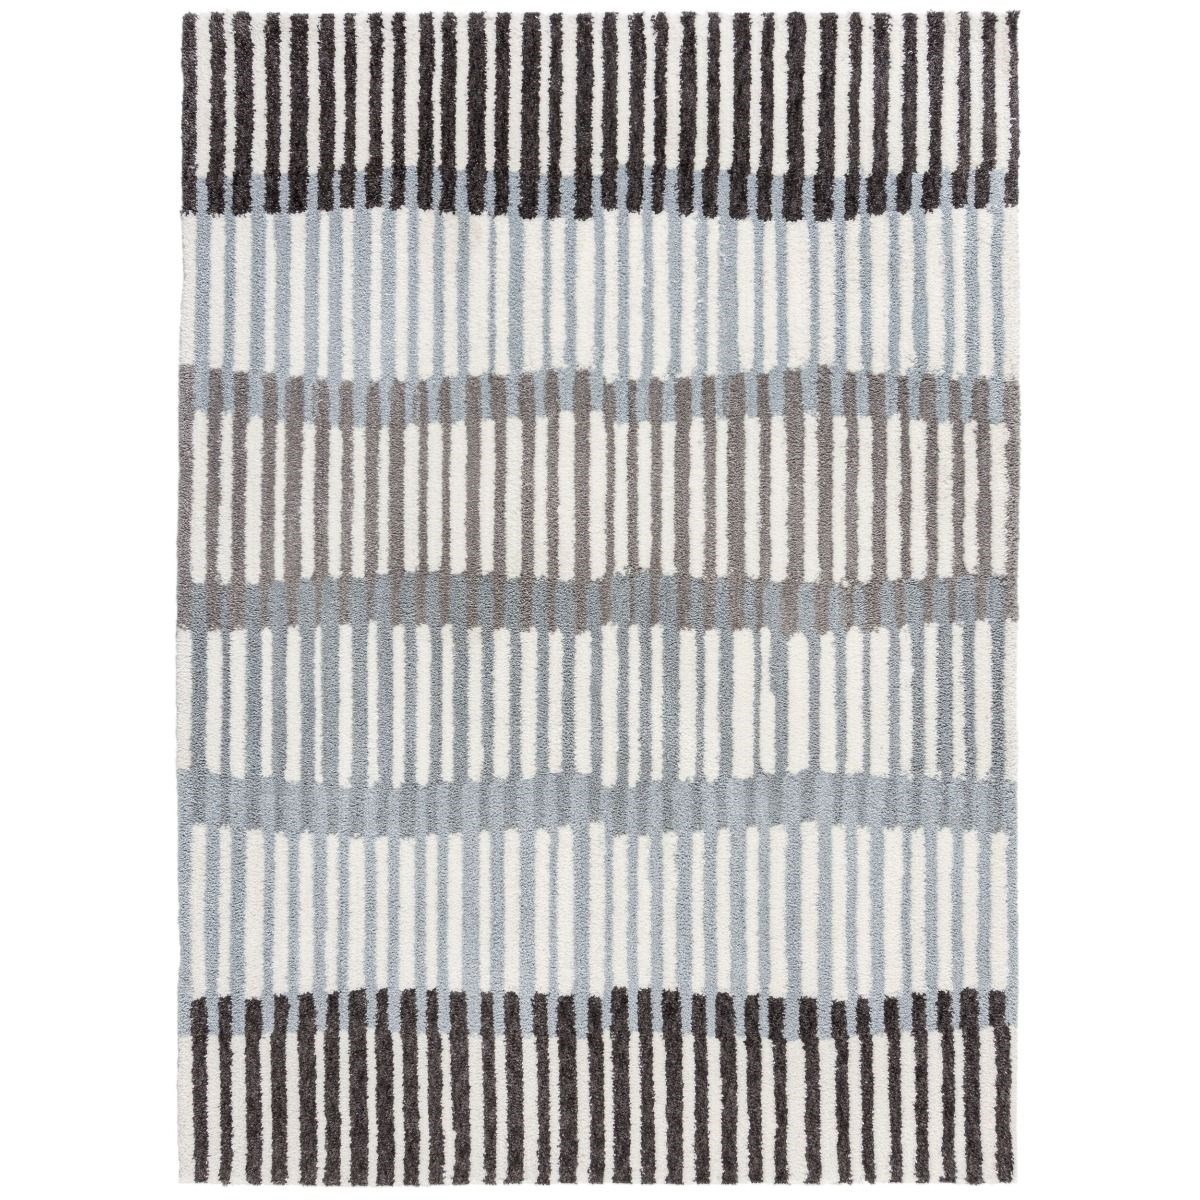 Tapis de salon moderne en Polyester Gris 120x170 cm